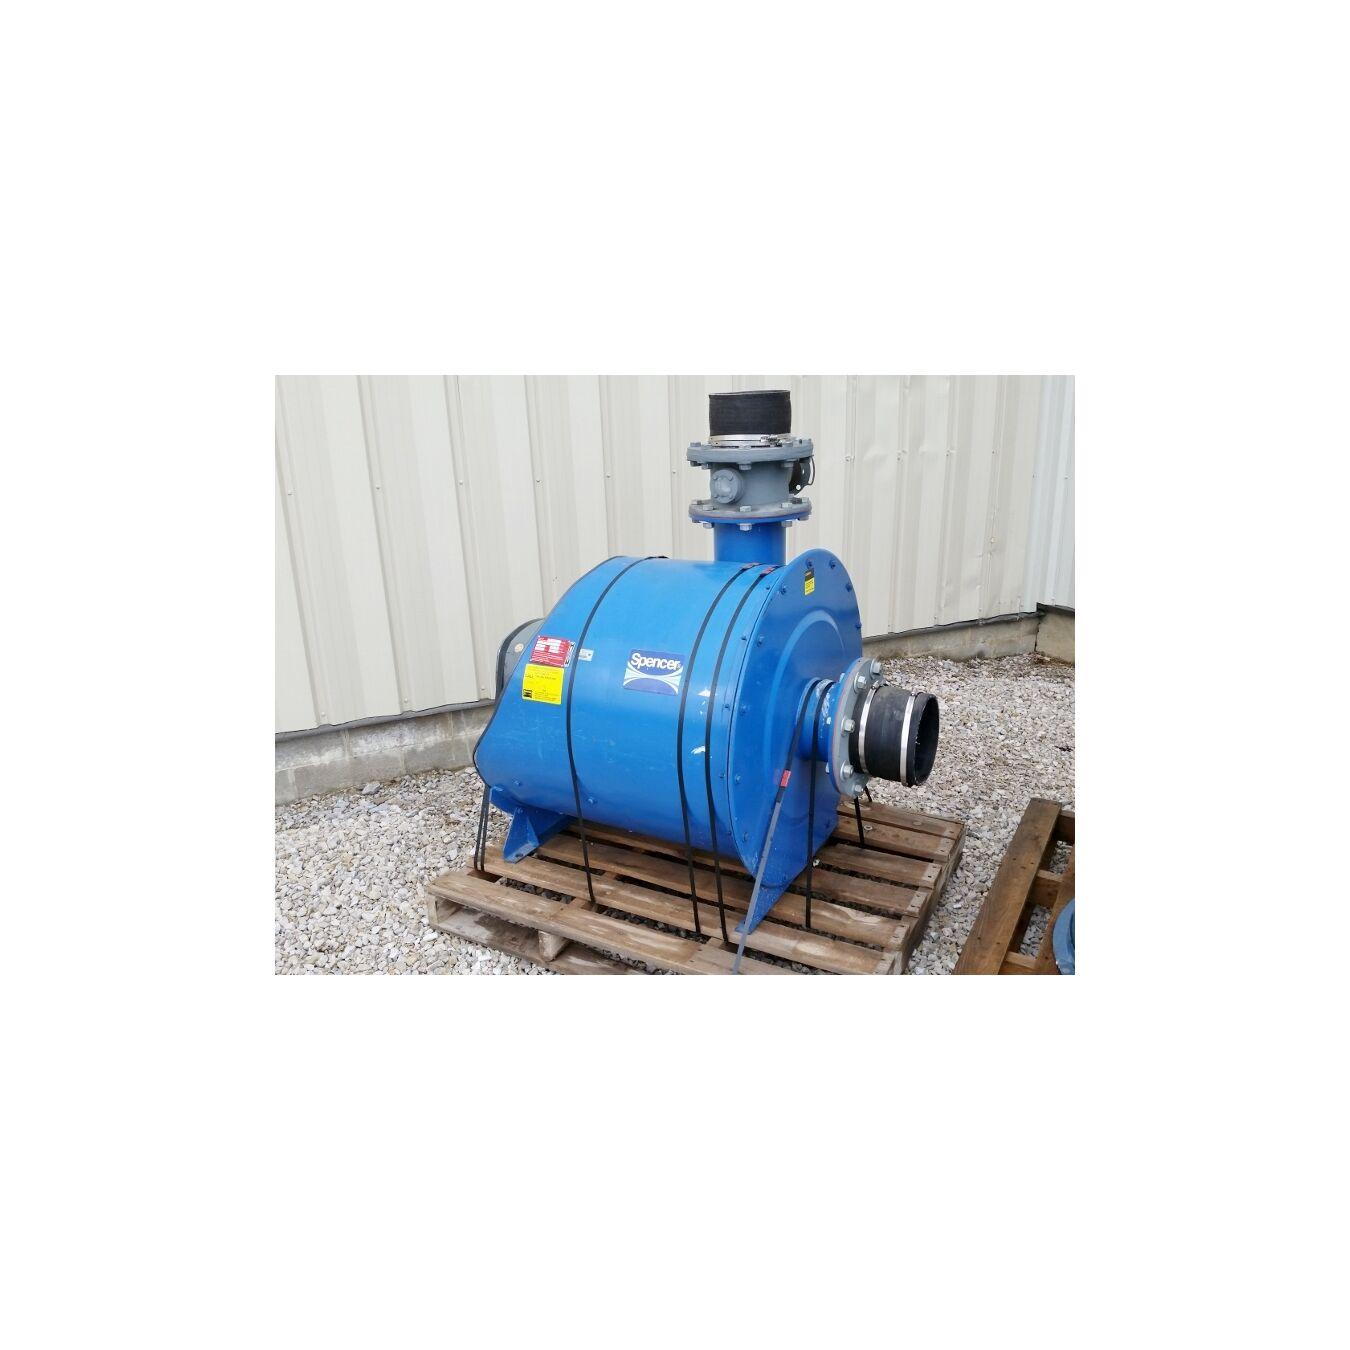 Industrial Dust Blowers : Cfm quot hg used hp spencer industrial vacuum